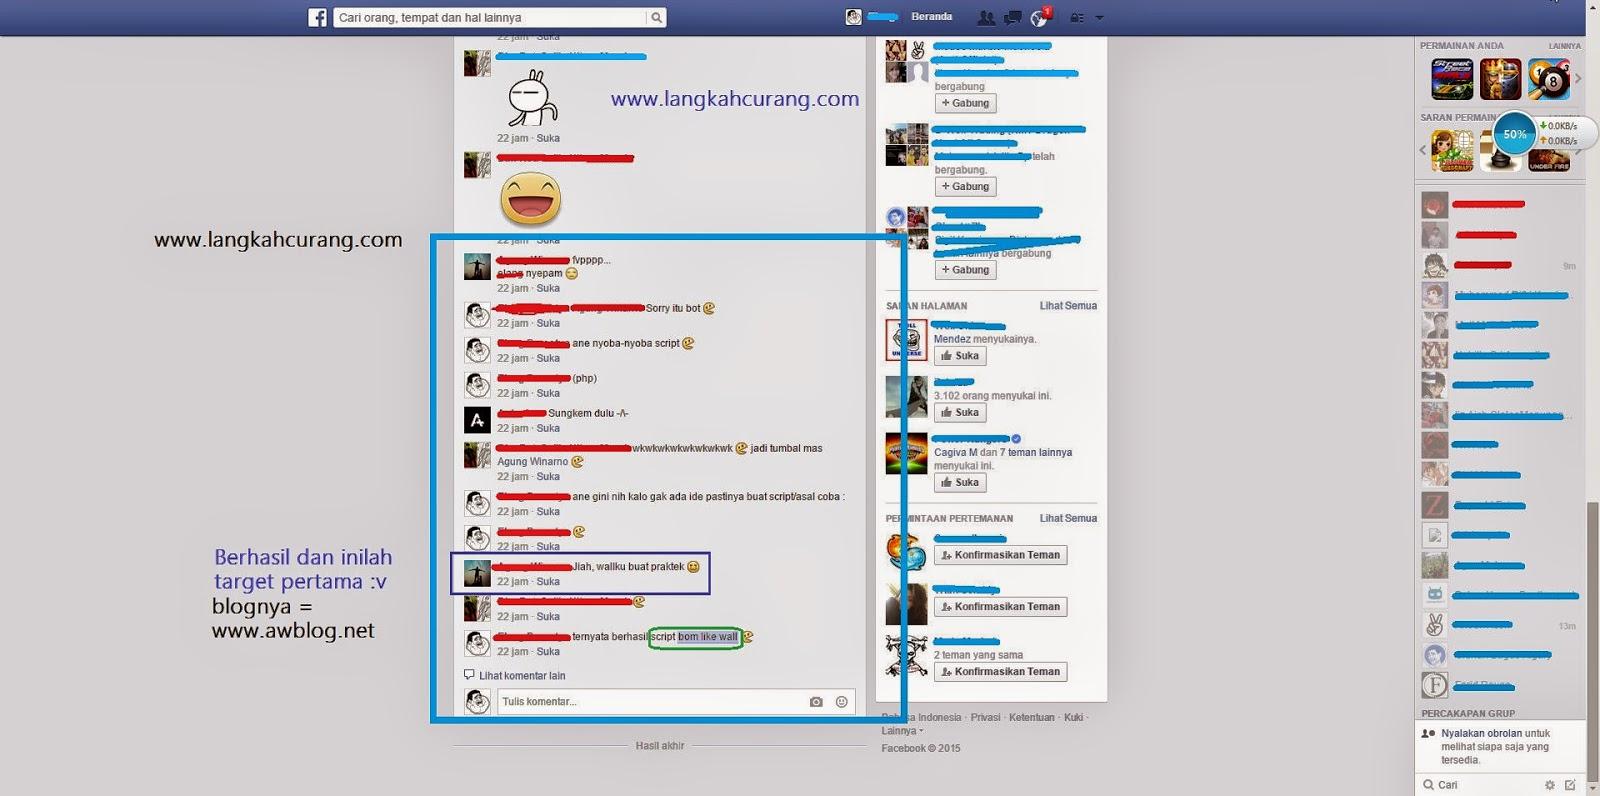 Lansiran Testimoni yang udah kena spam like wall blog greget :v